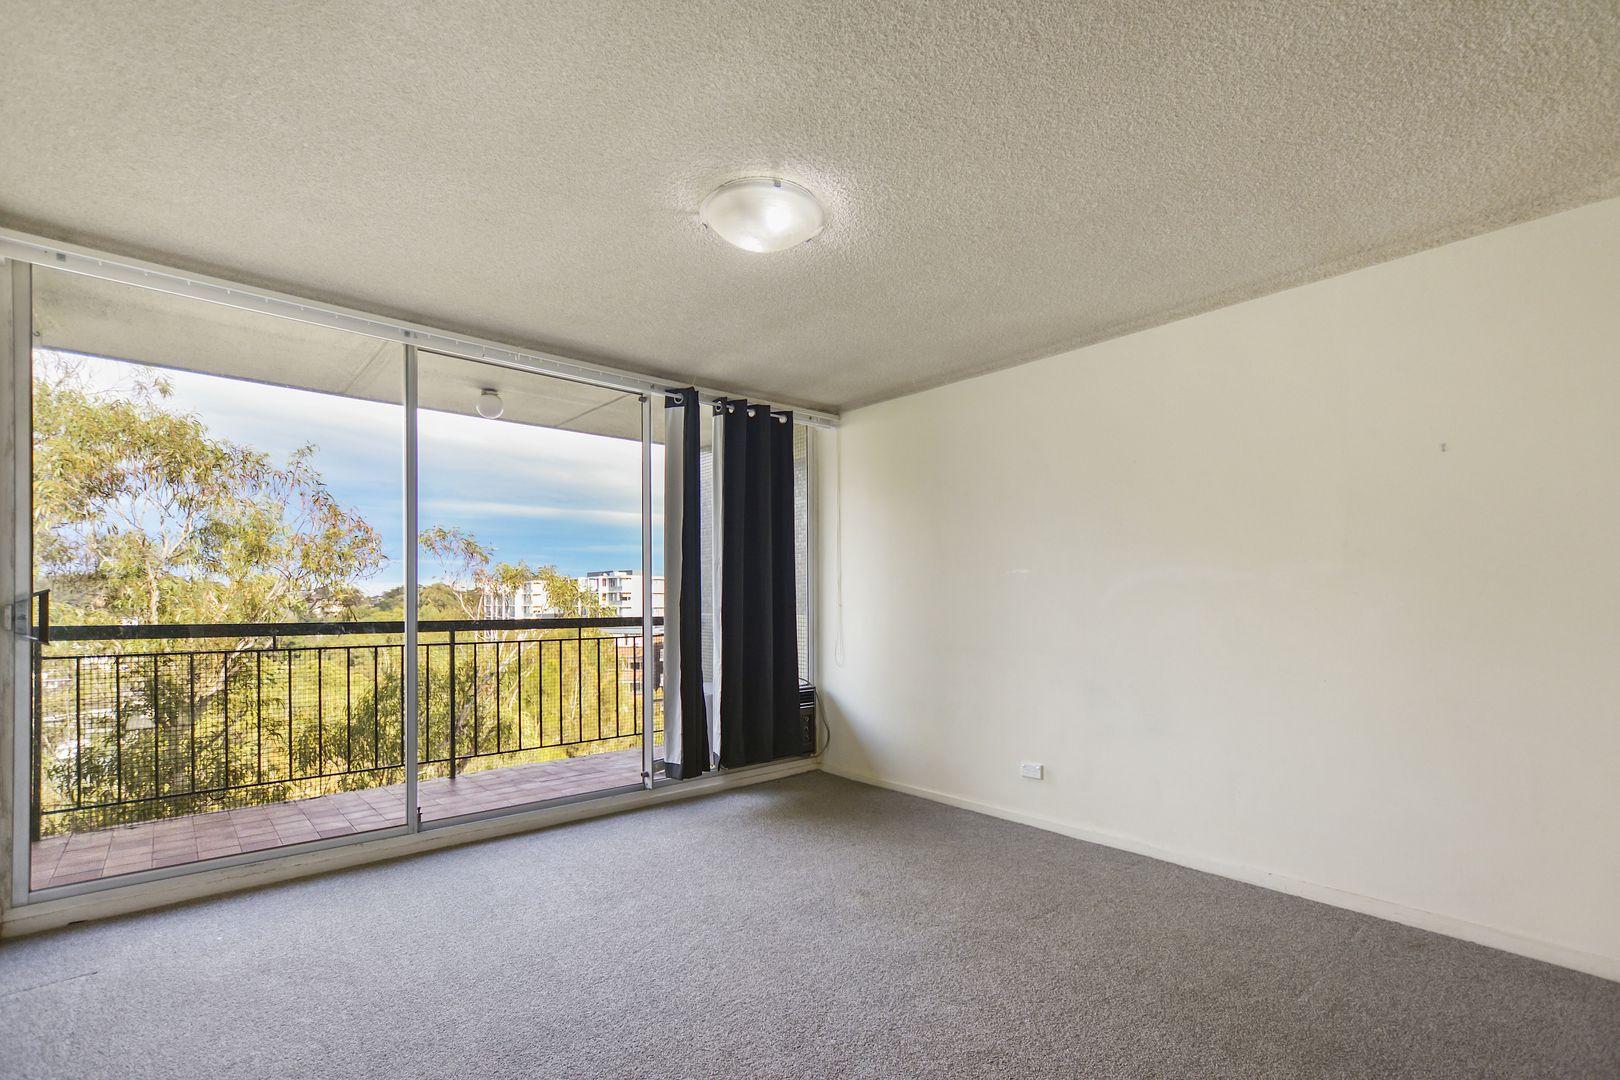 27/300a Burns Bay Road, Lane Cove NSW 2066, Image 1